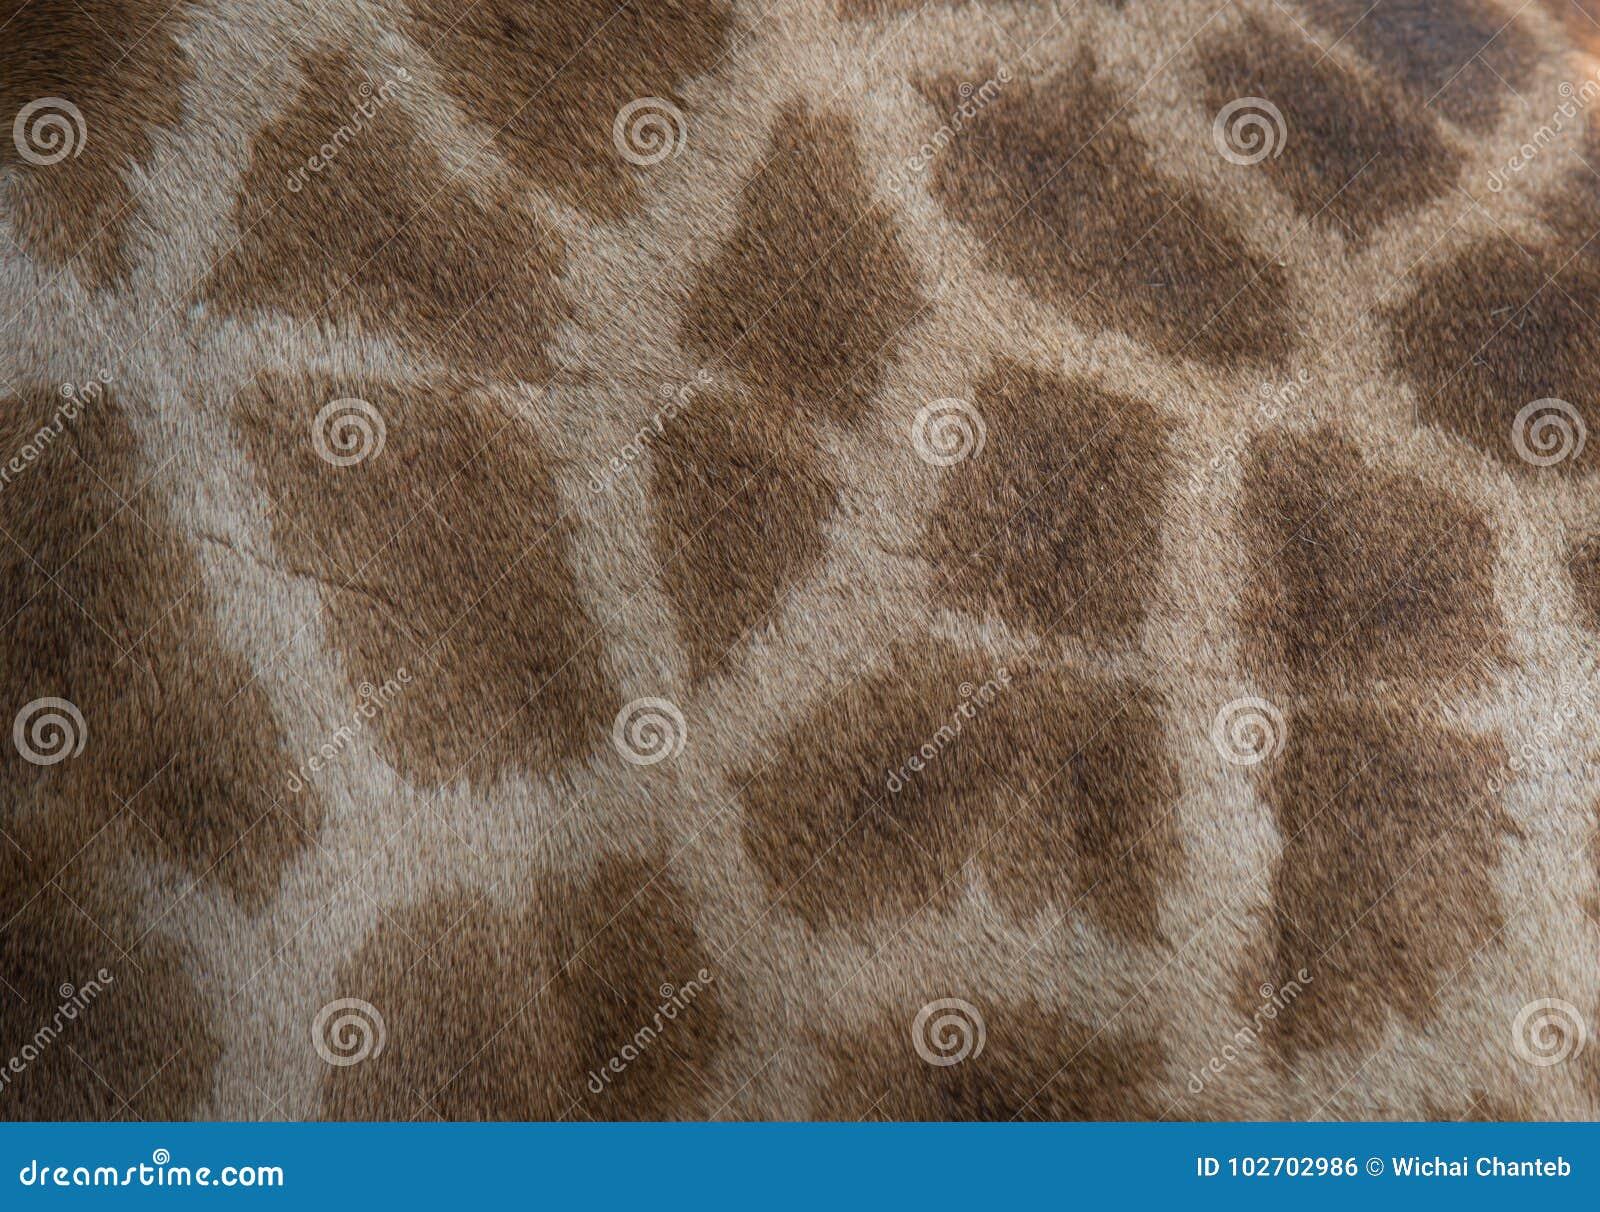 genuine leather skin of giraffe textured skin of giraffe stock